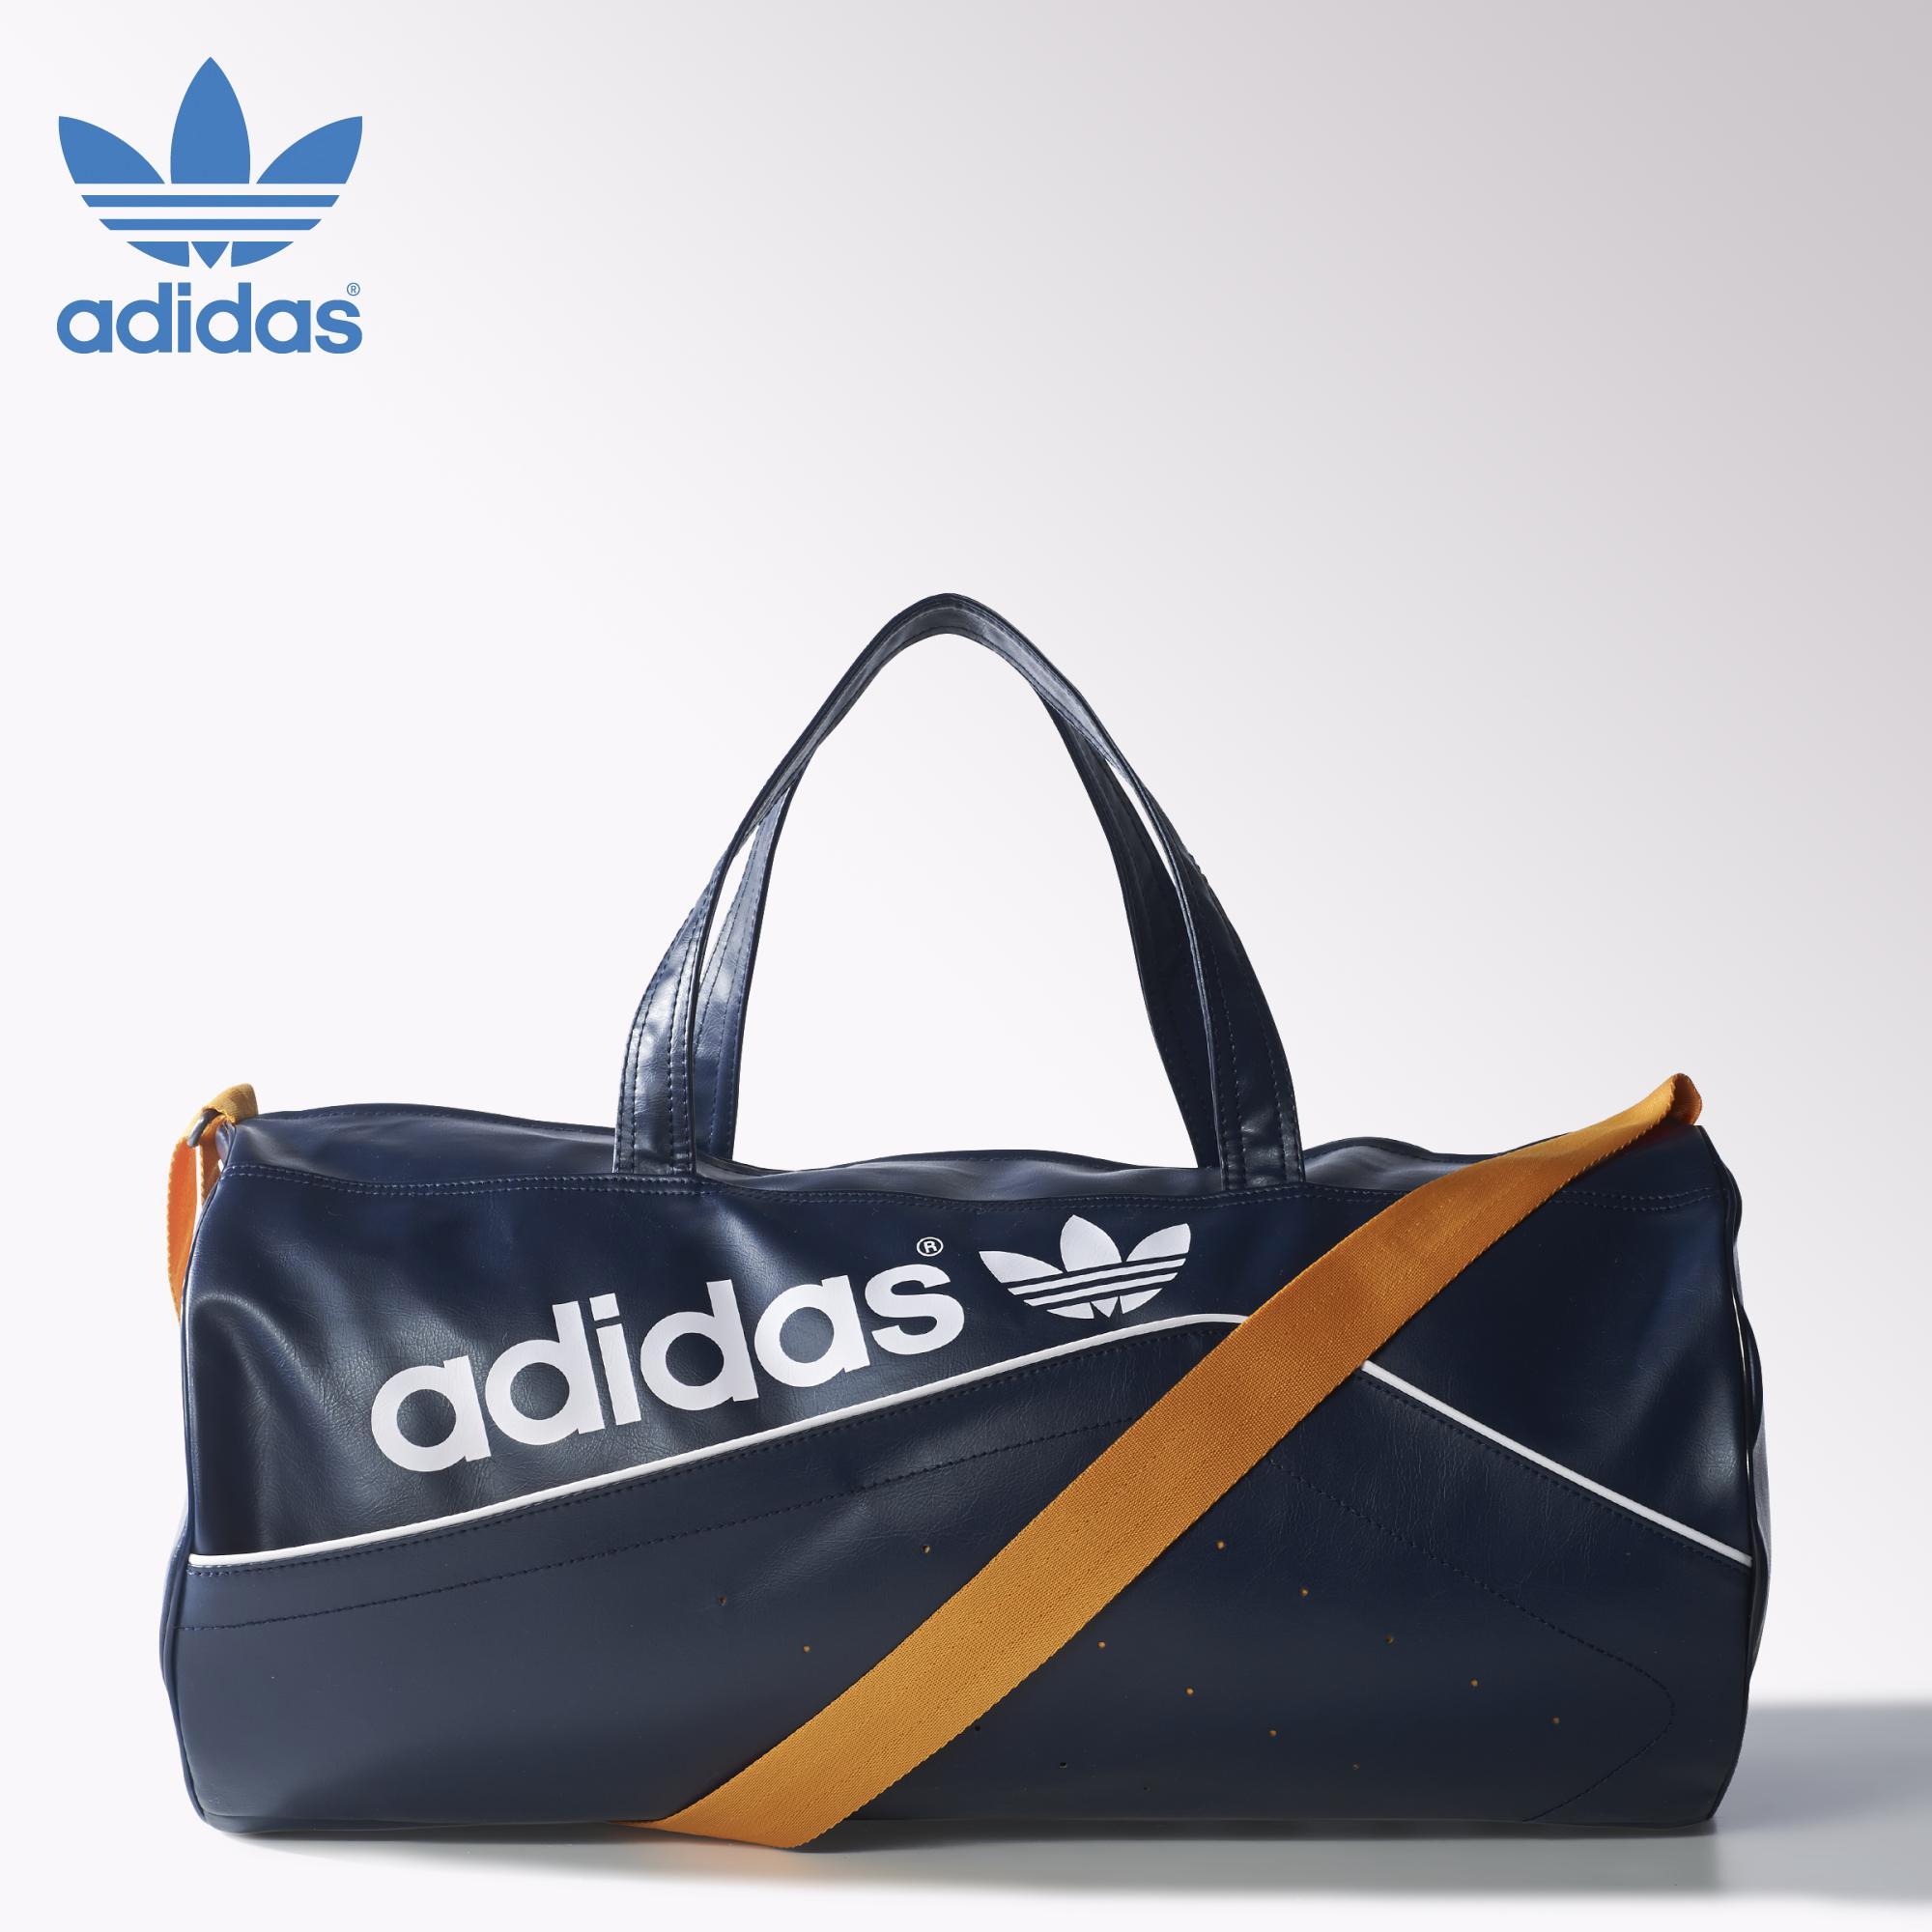 Adidas S20237 Con Asas Hombre Bolsa Perforated sQdCrth